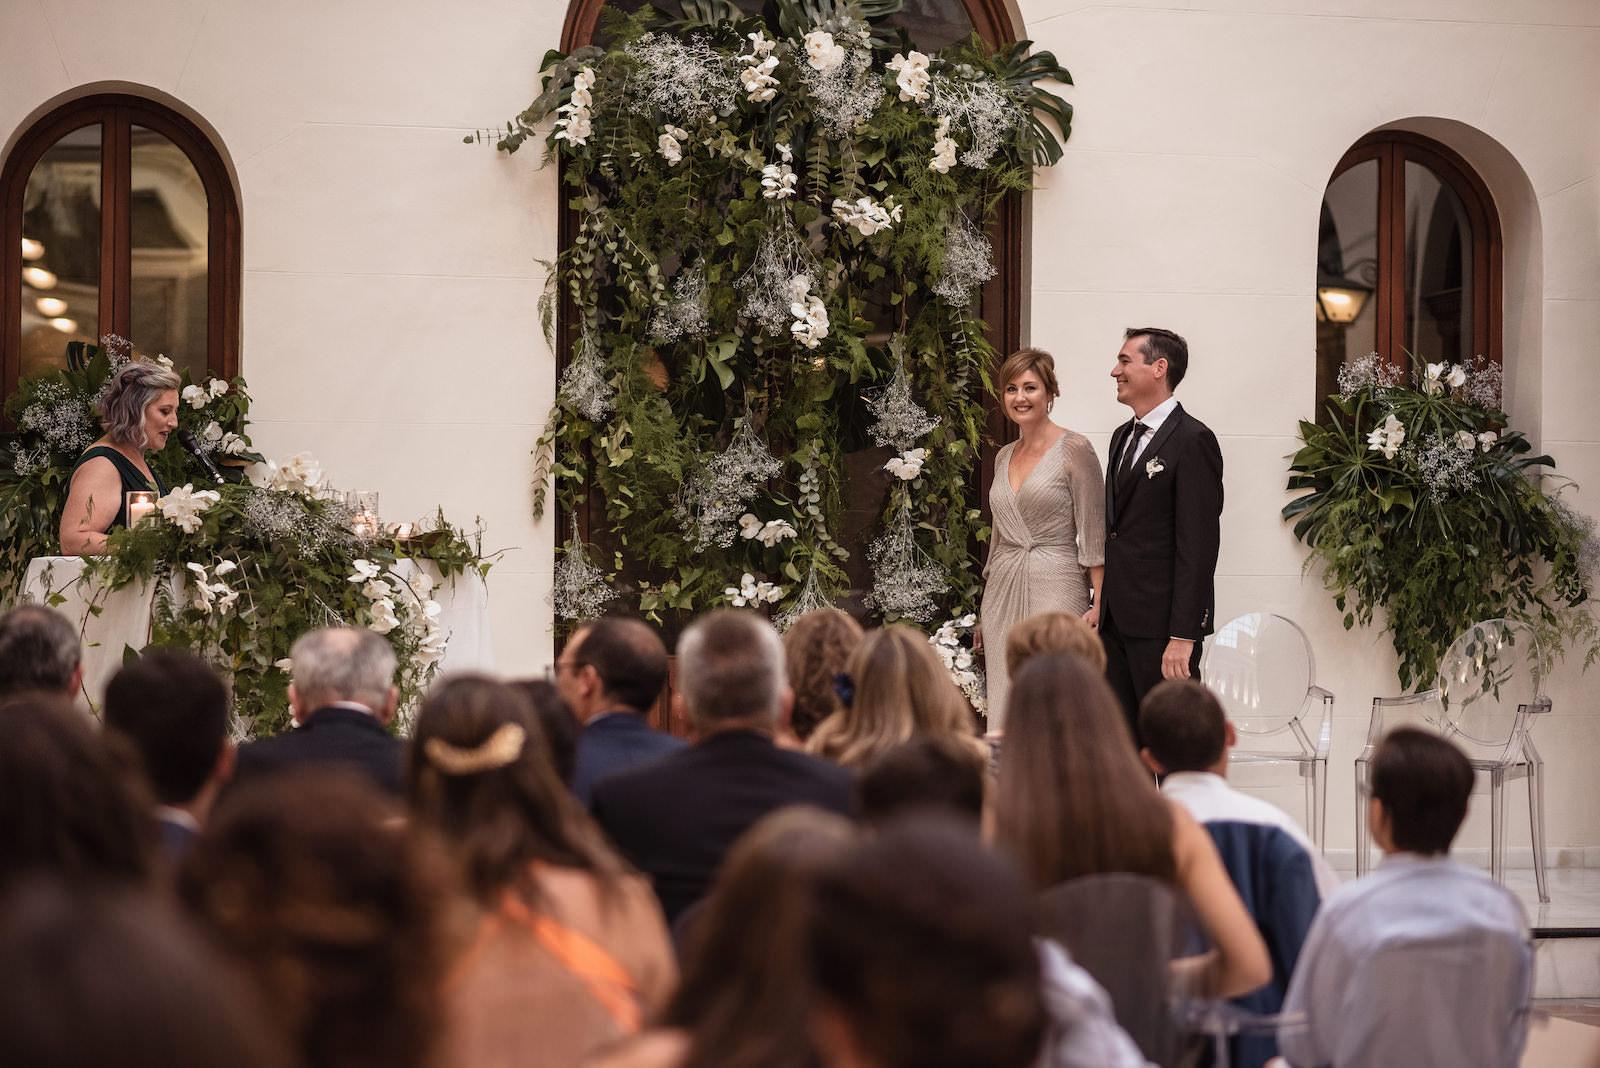 fotografia de boda pareja novios en altar murcia levante